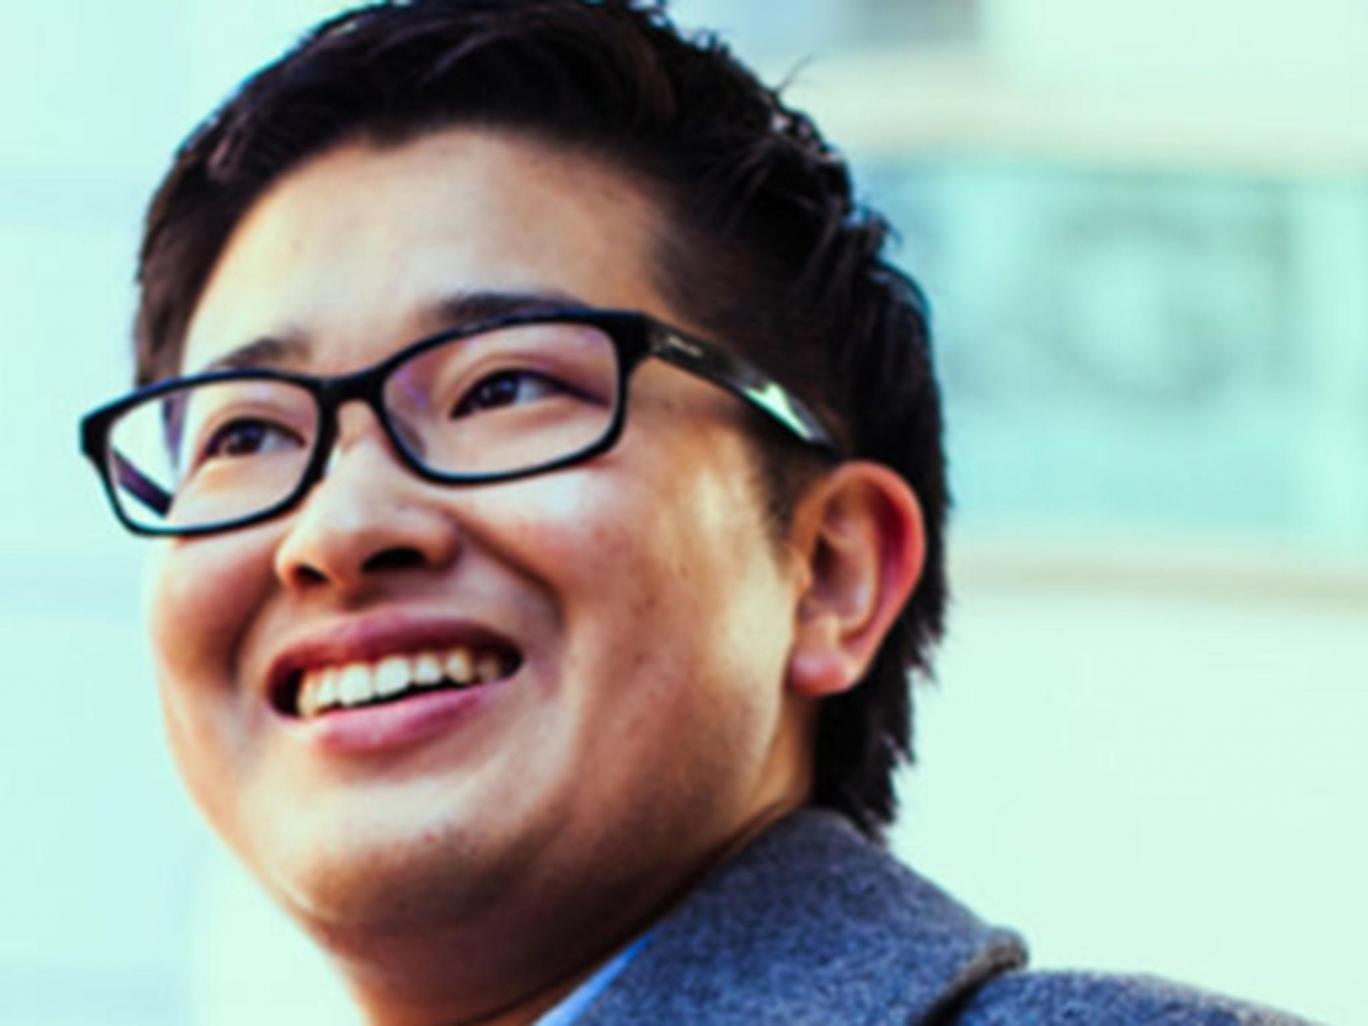 Tomoya Hosoda transgender Japan